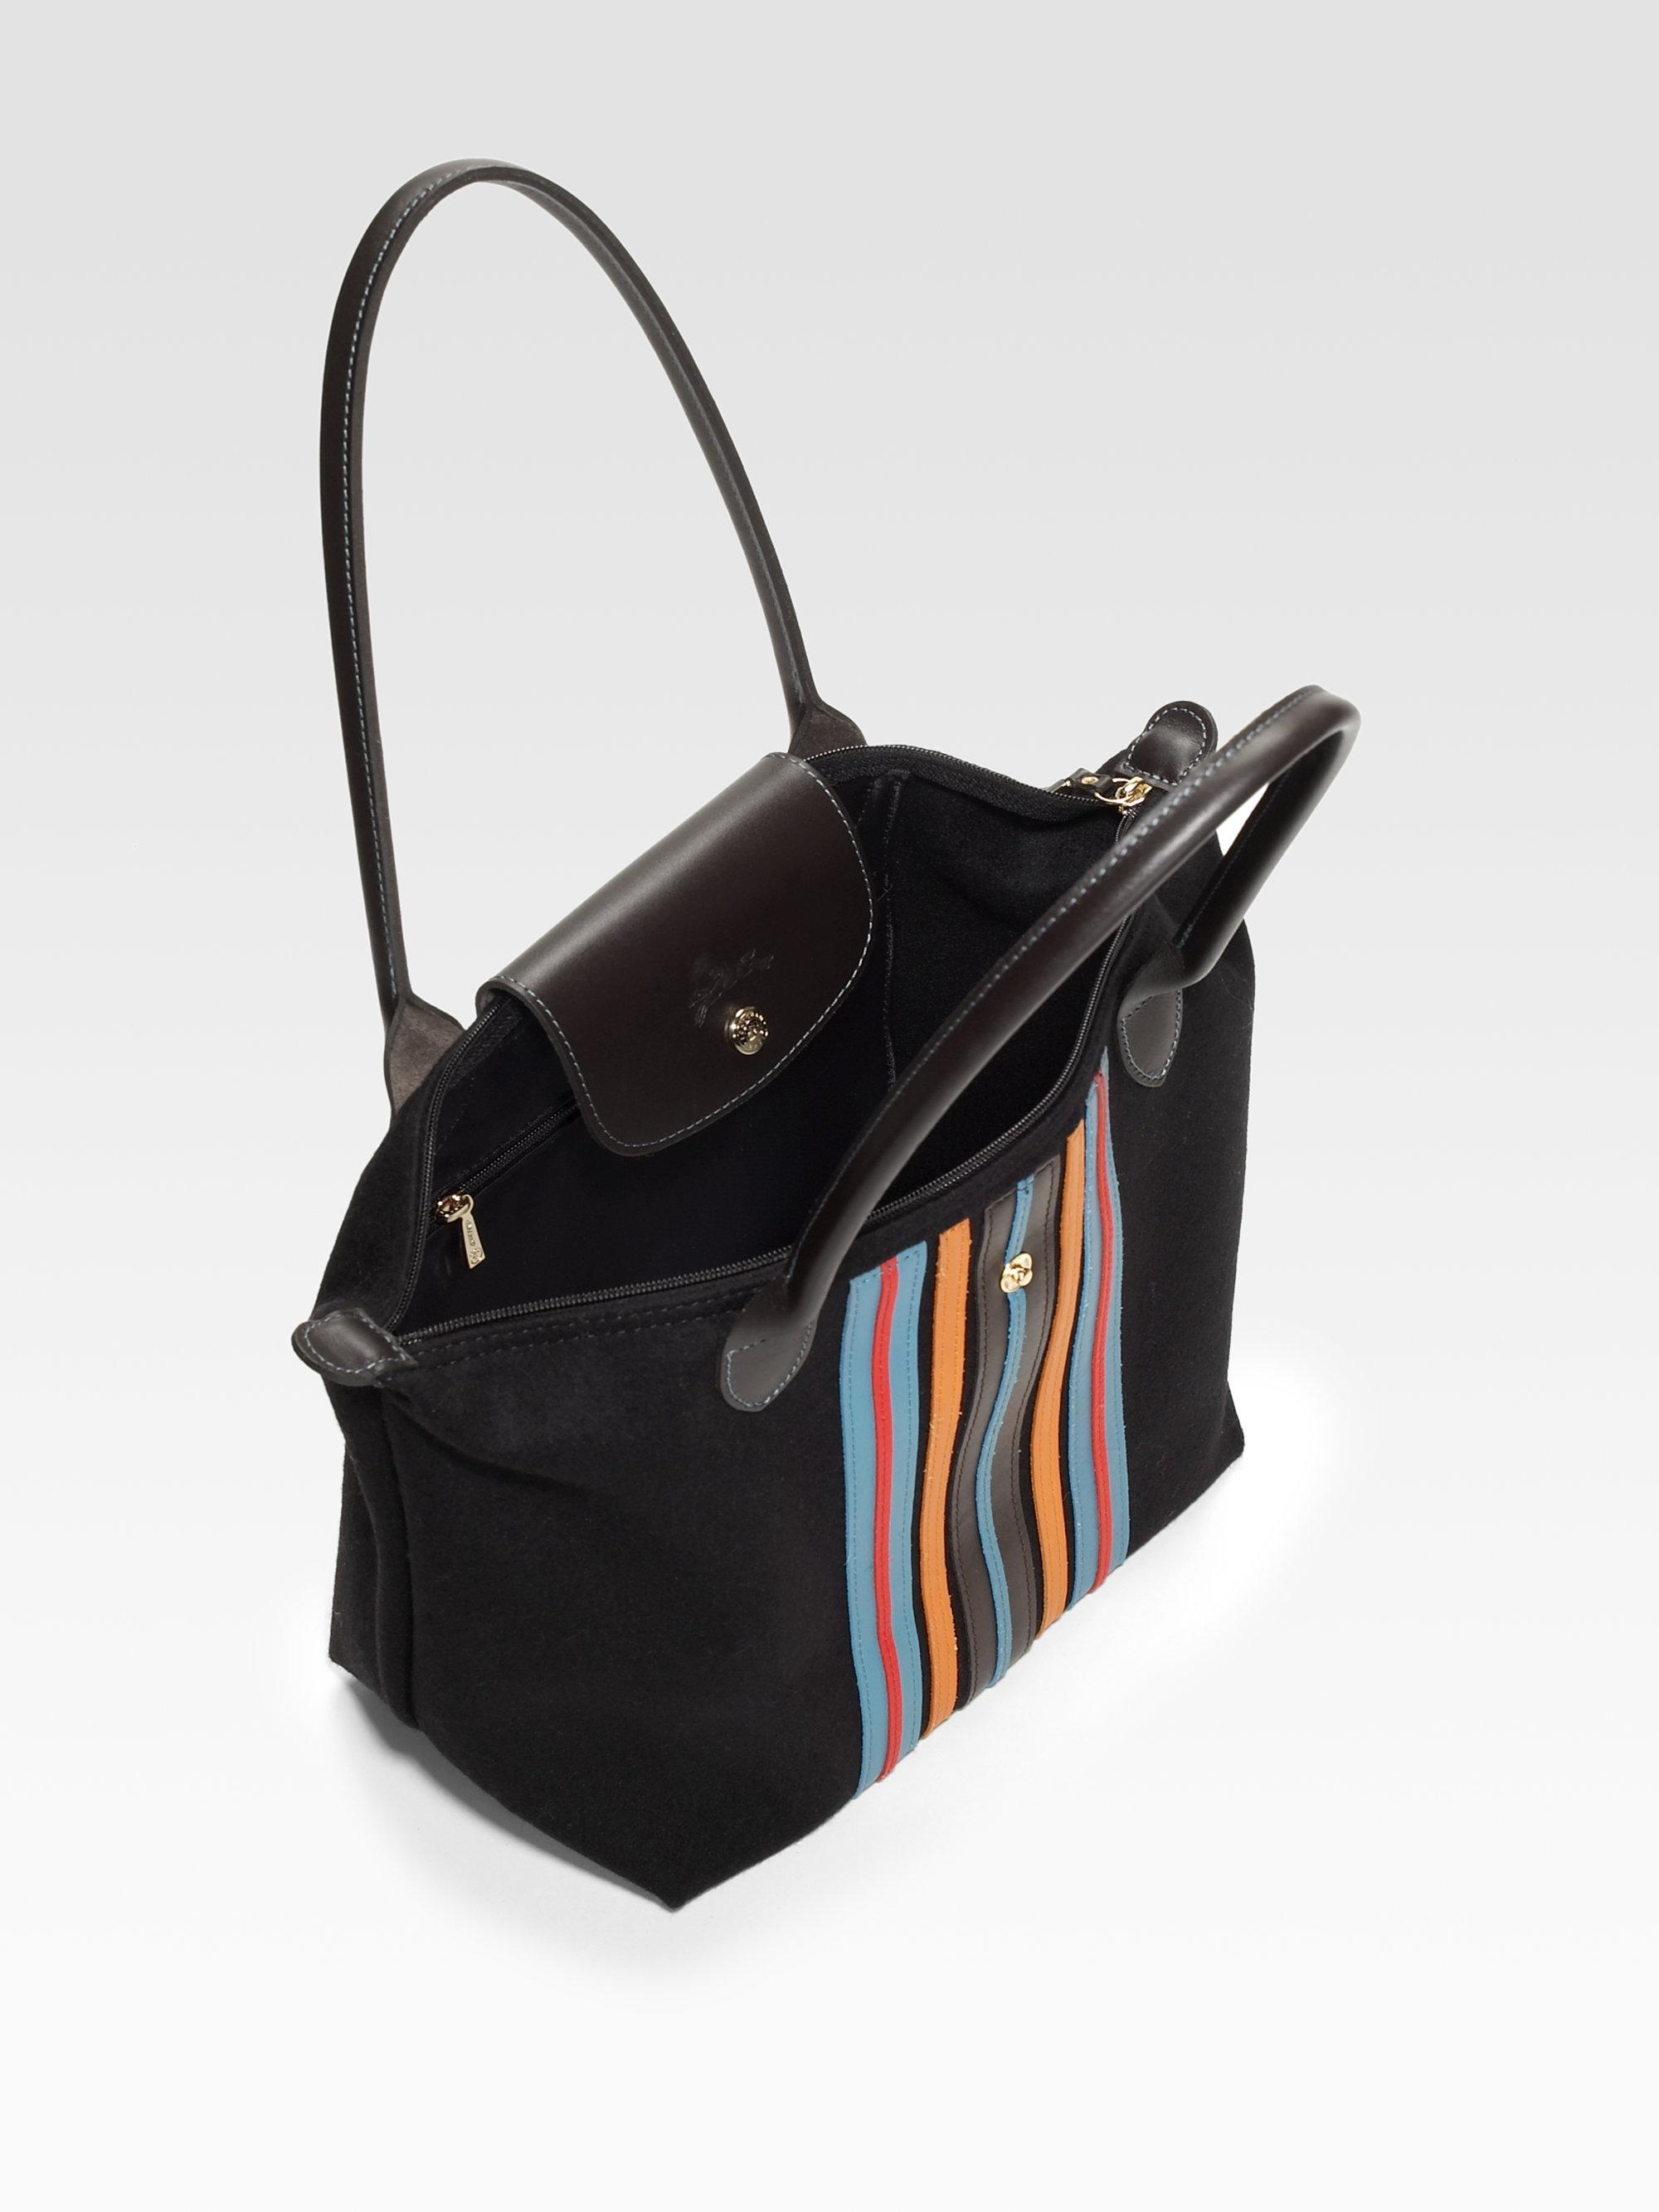 Lyst - Longchamp Le Pliage Plaid Small Tote Bag d184fae2d0e6a